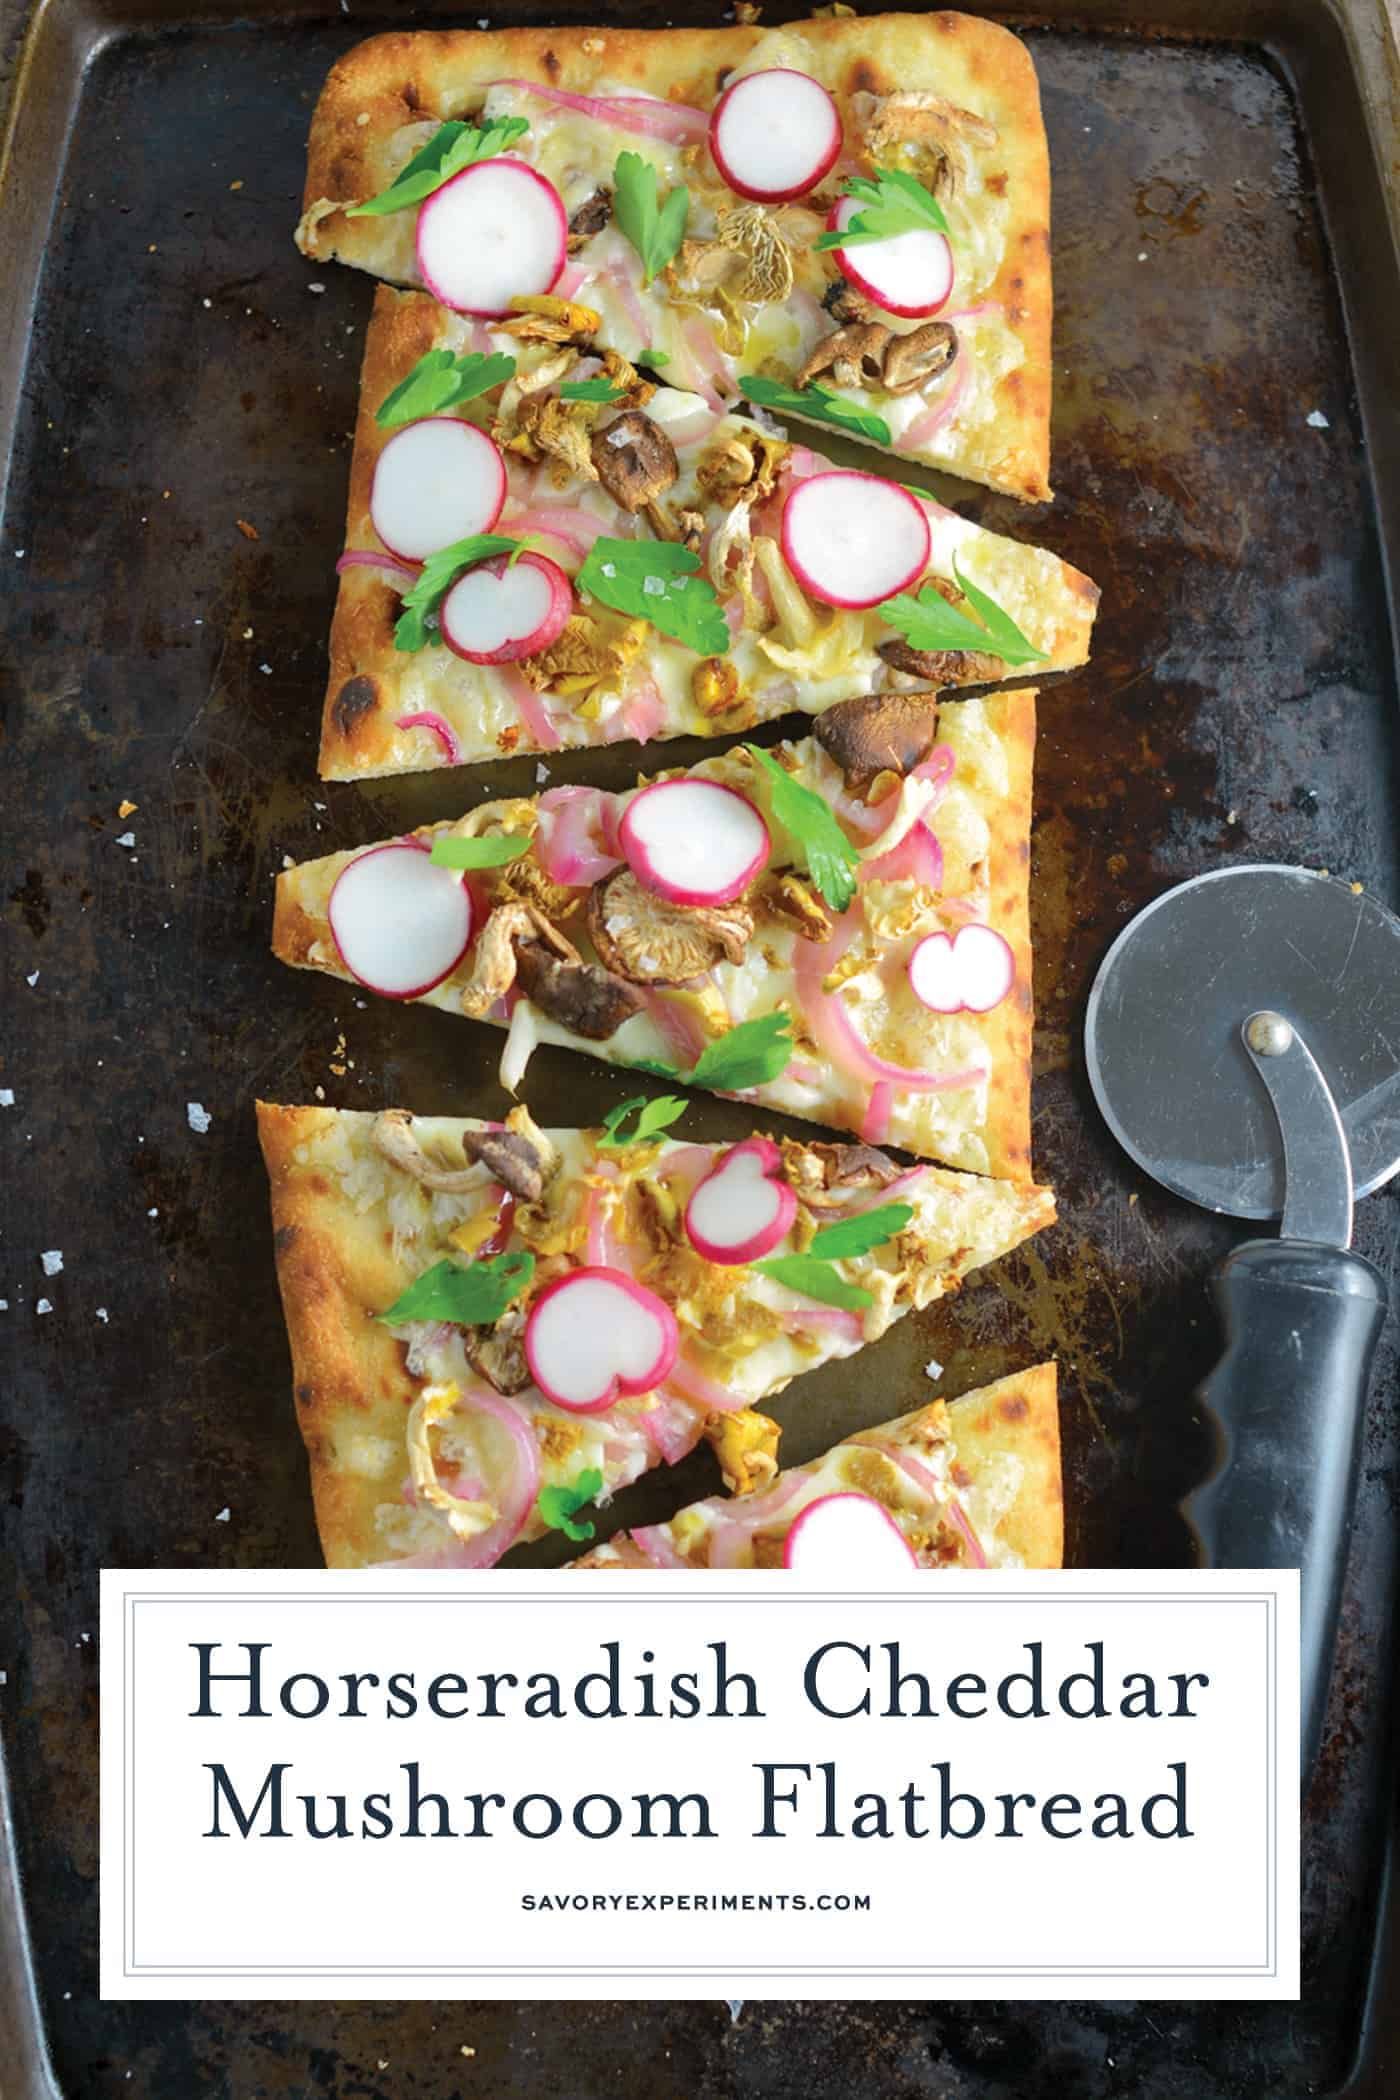 Horseradish Cheddar Mushroom Flatbread combines a mushroom blend, fresh radishes, pickled red onion, tangy horseradish cheddar cheese, Italian parsley and Maldon sea salt. Delicious!#vegetarianappetizers #flatbreadrecipes www.savoryexperiments.com